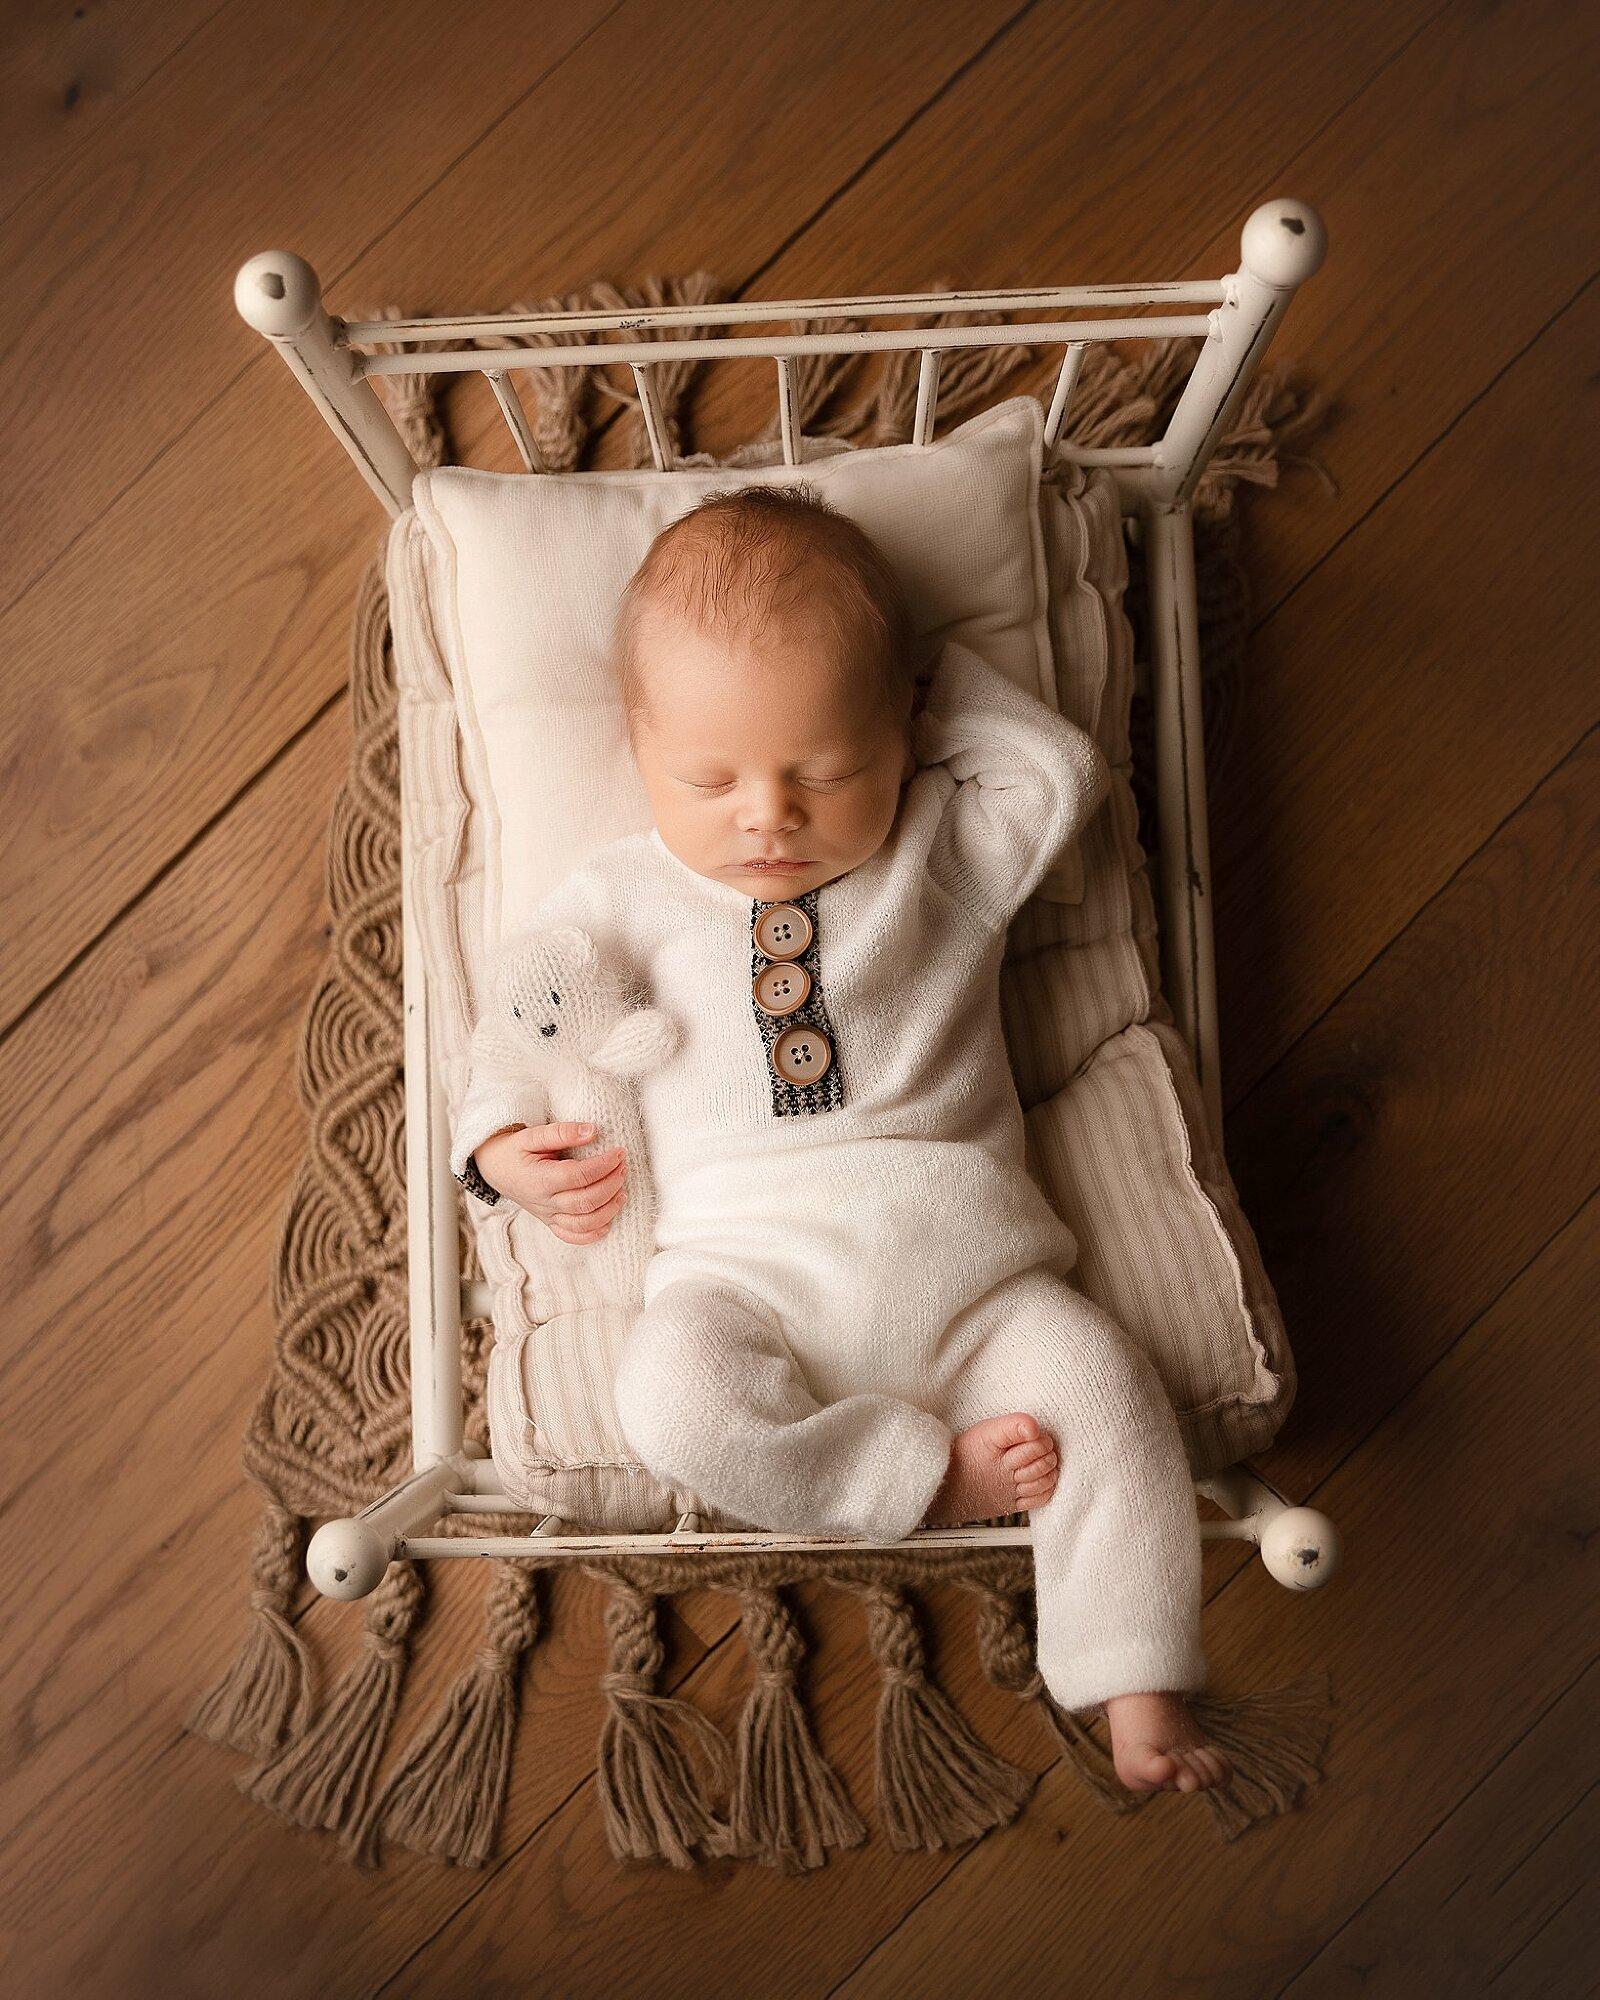 newborn baby boy photo studio hereford, Herefordshire, cheltenham, Gloucester